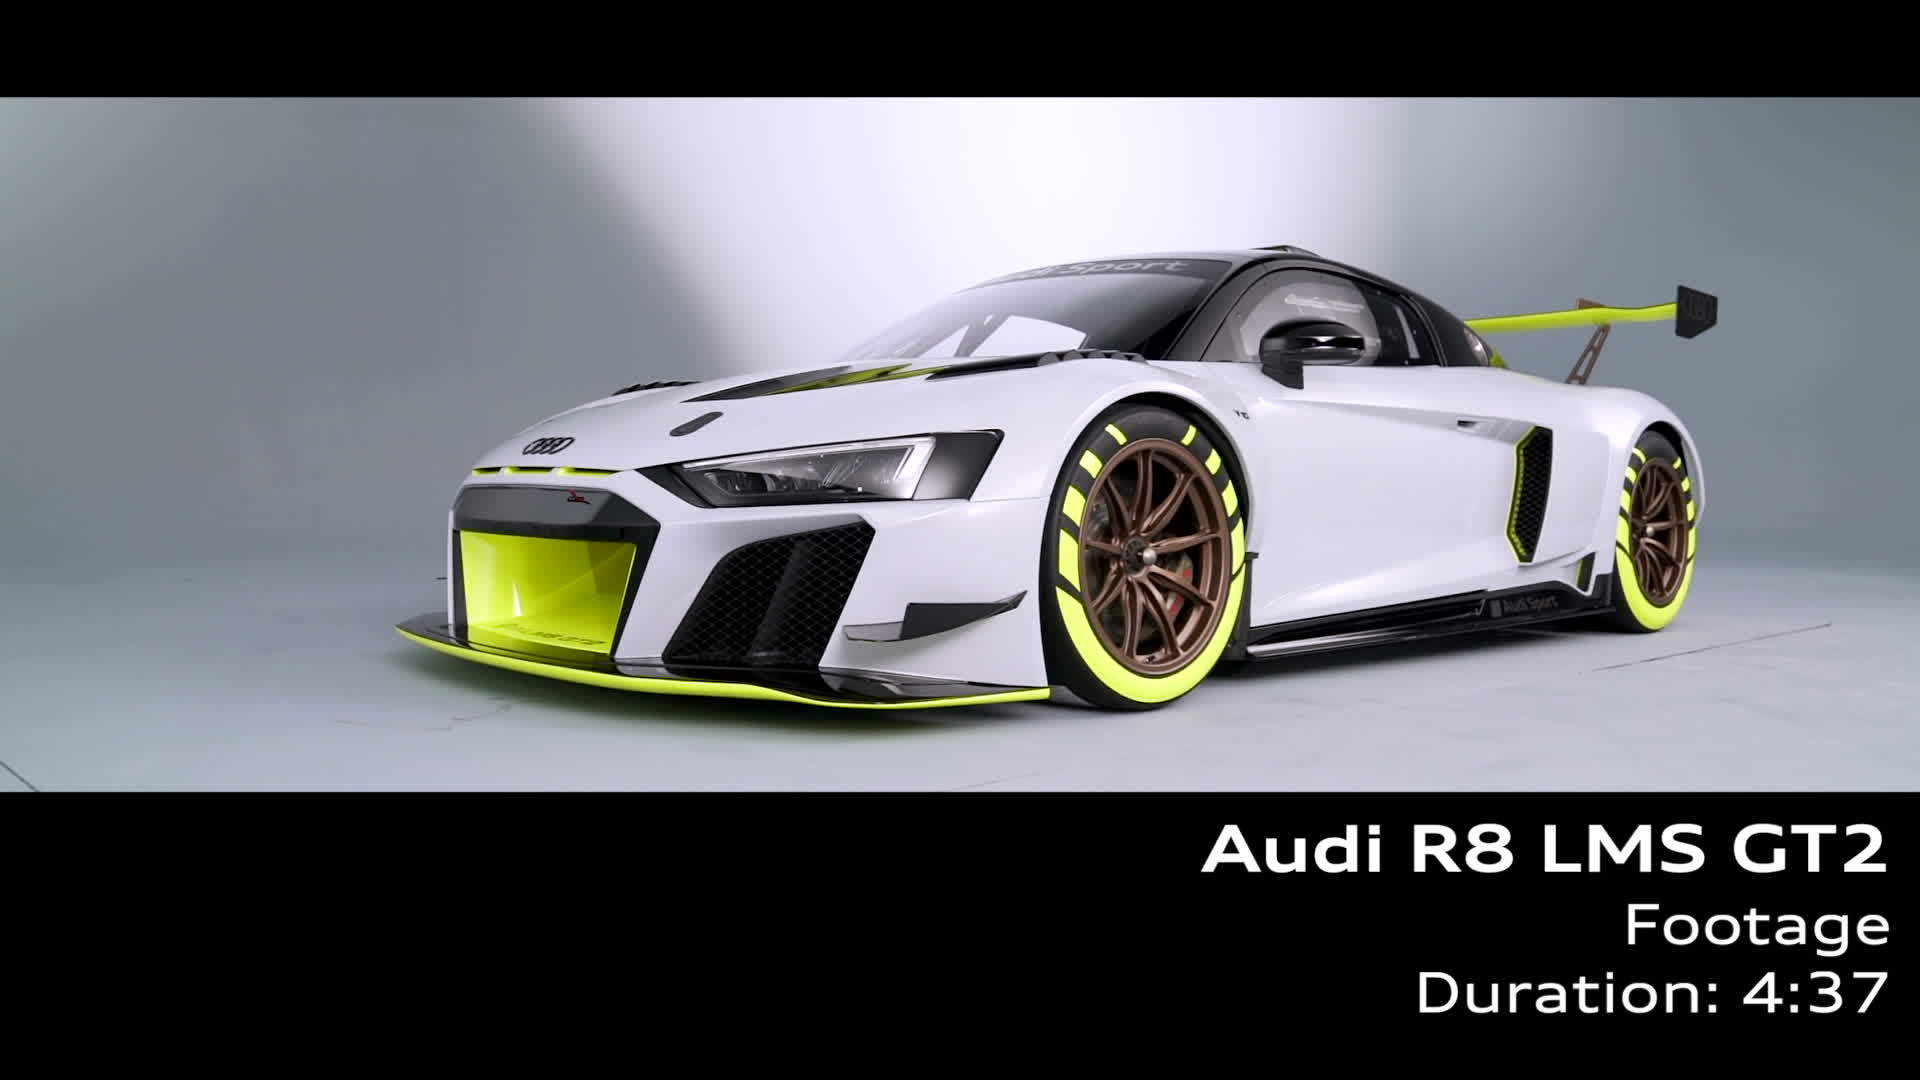 Audi R8 LMS GT2 2019 Audi MediaCenter 1920x1080